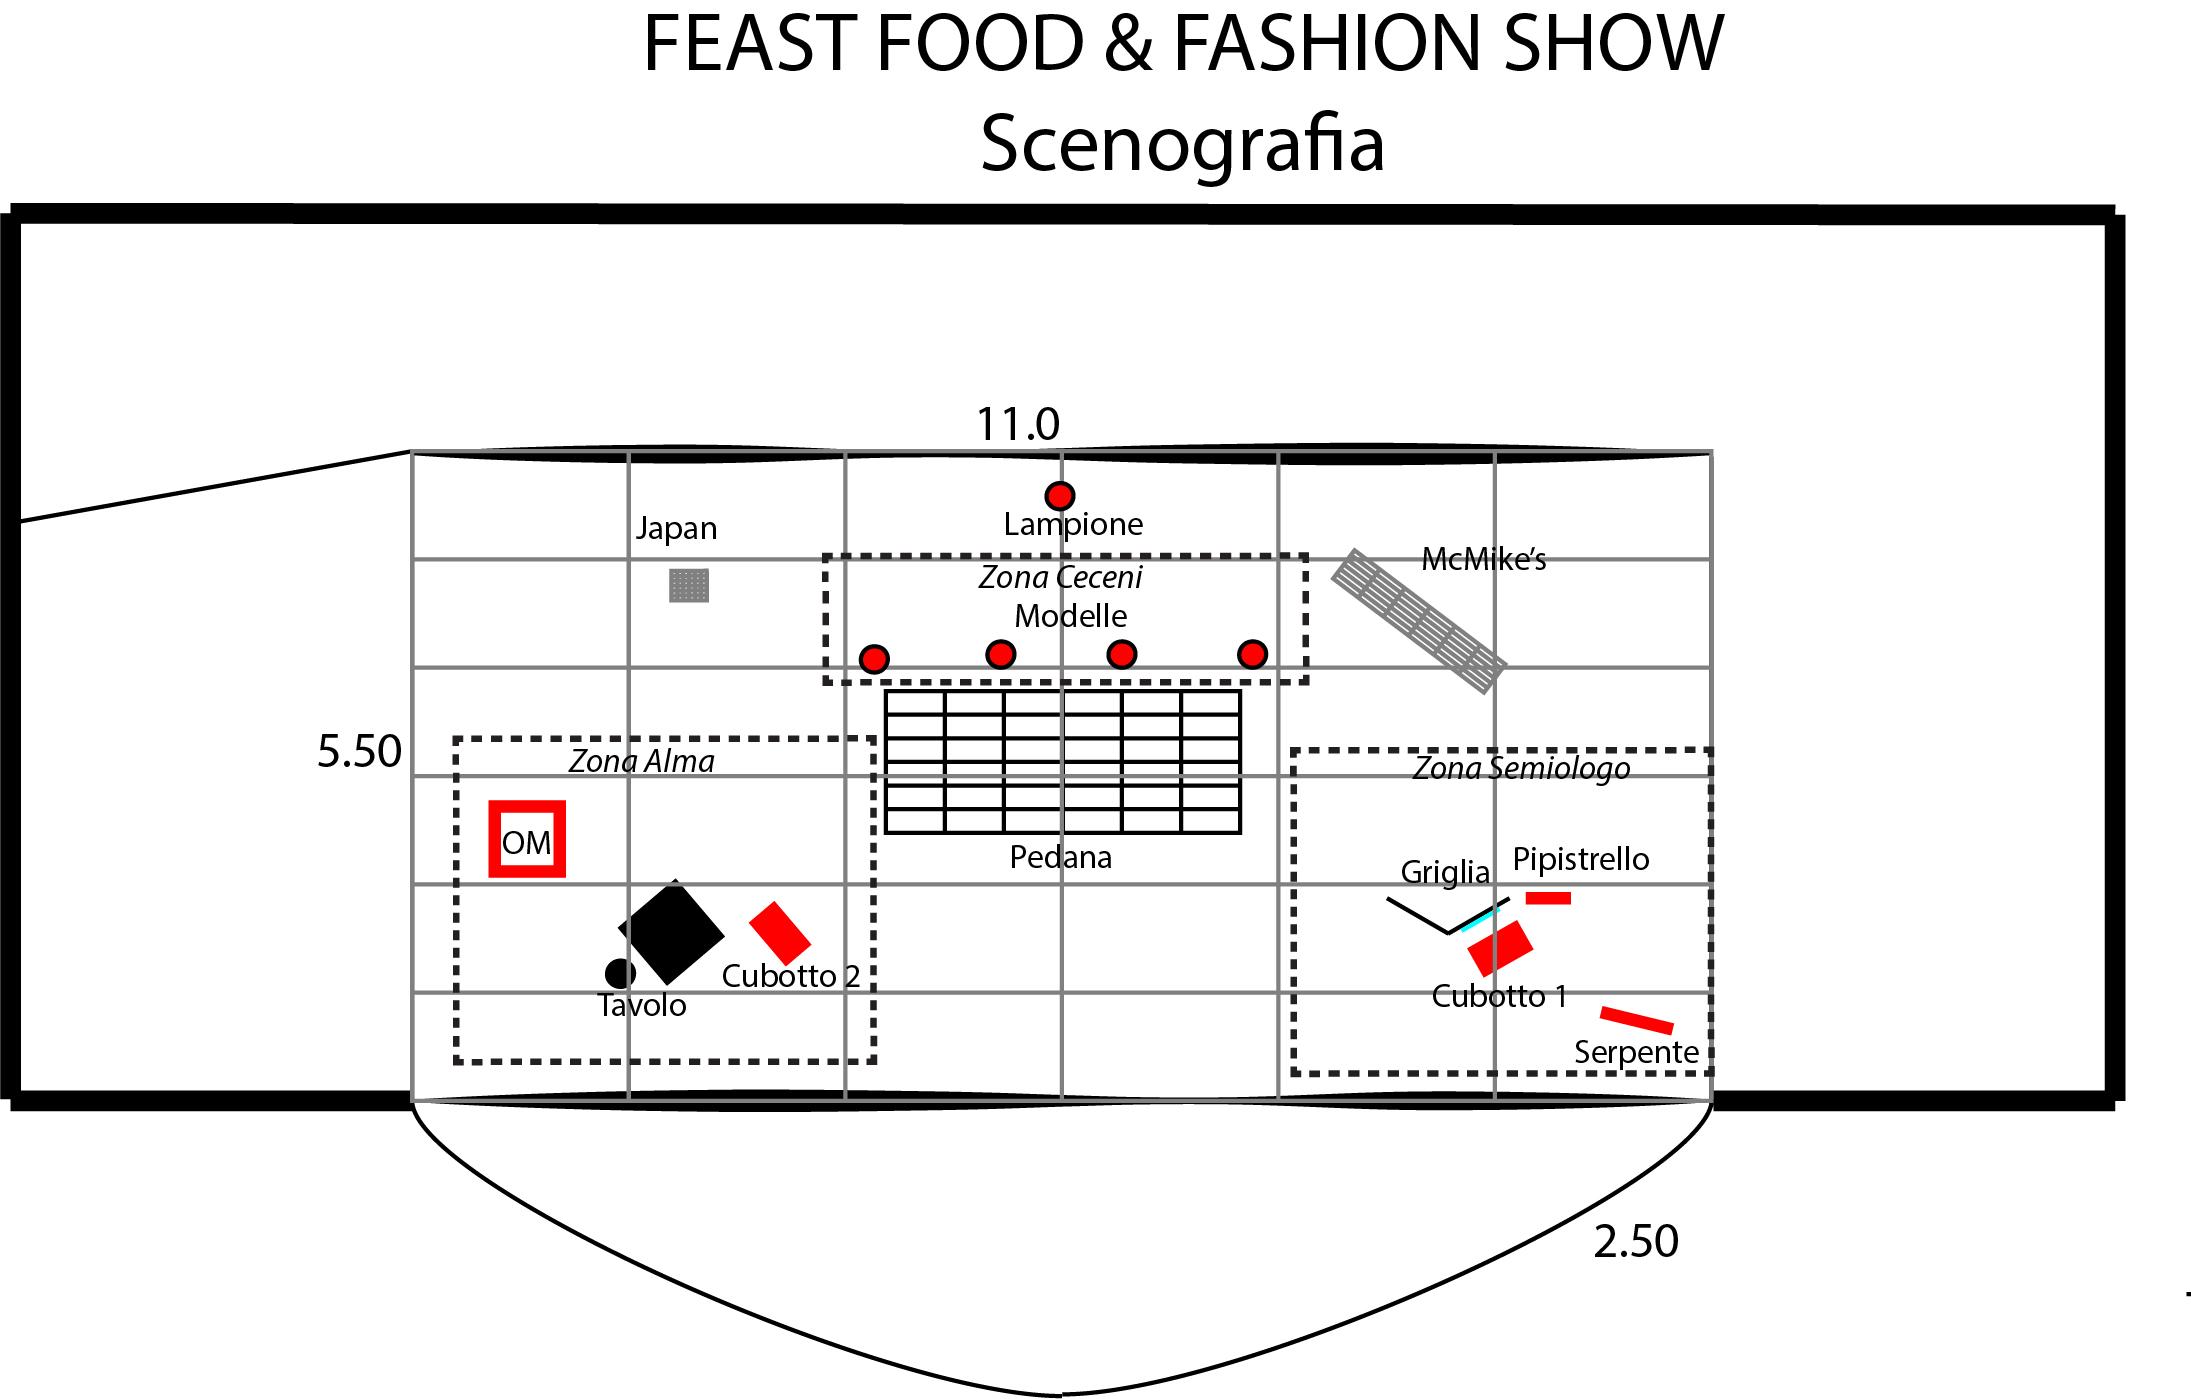 scenografia-feast-food